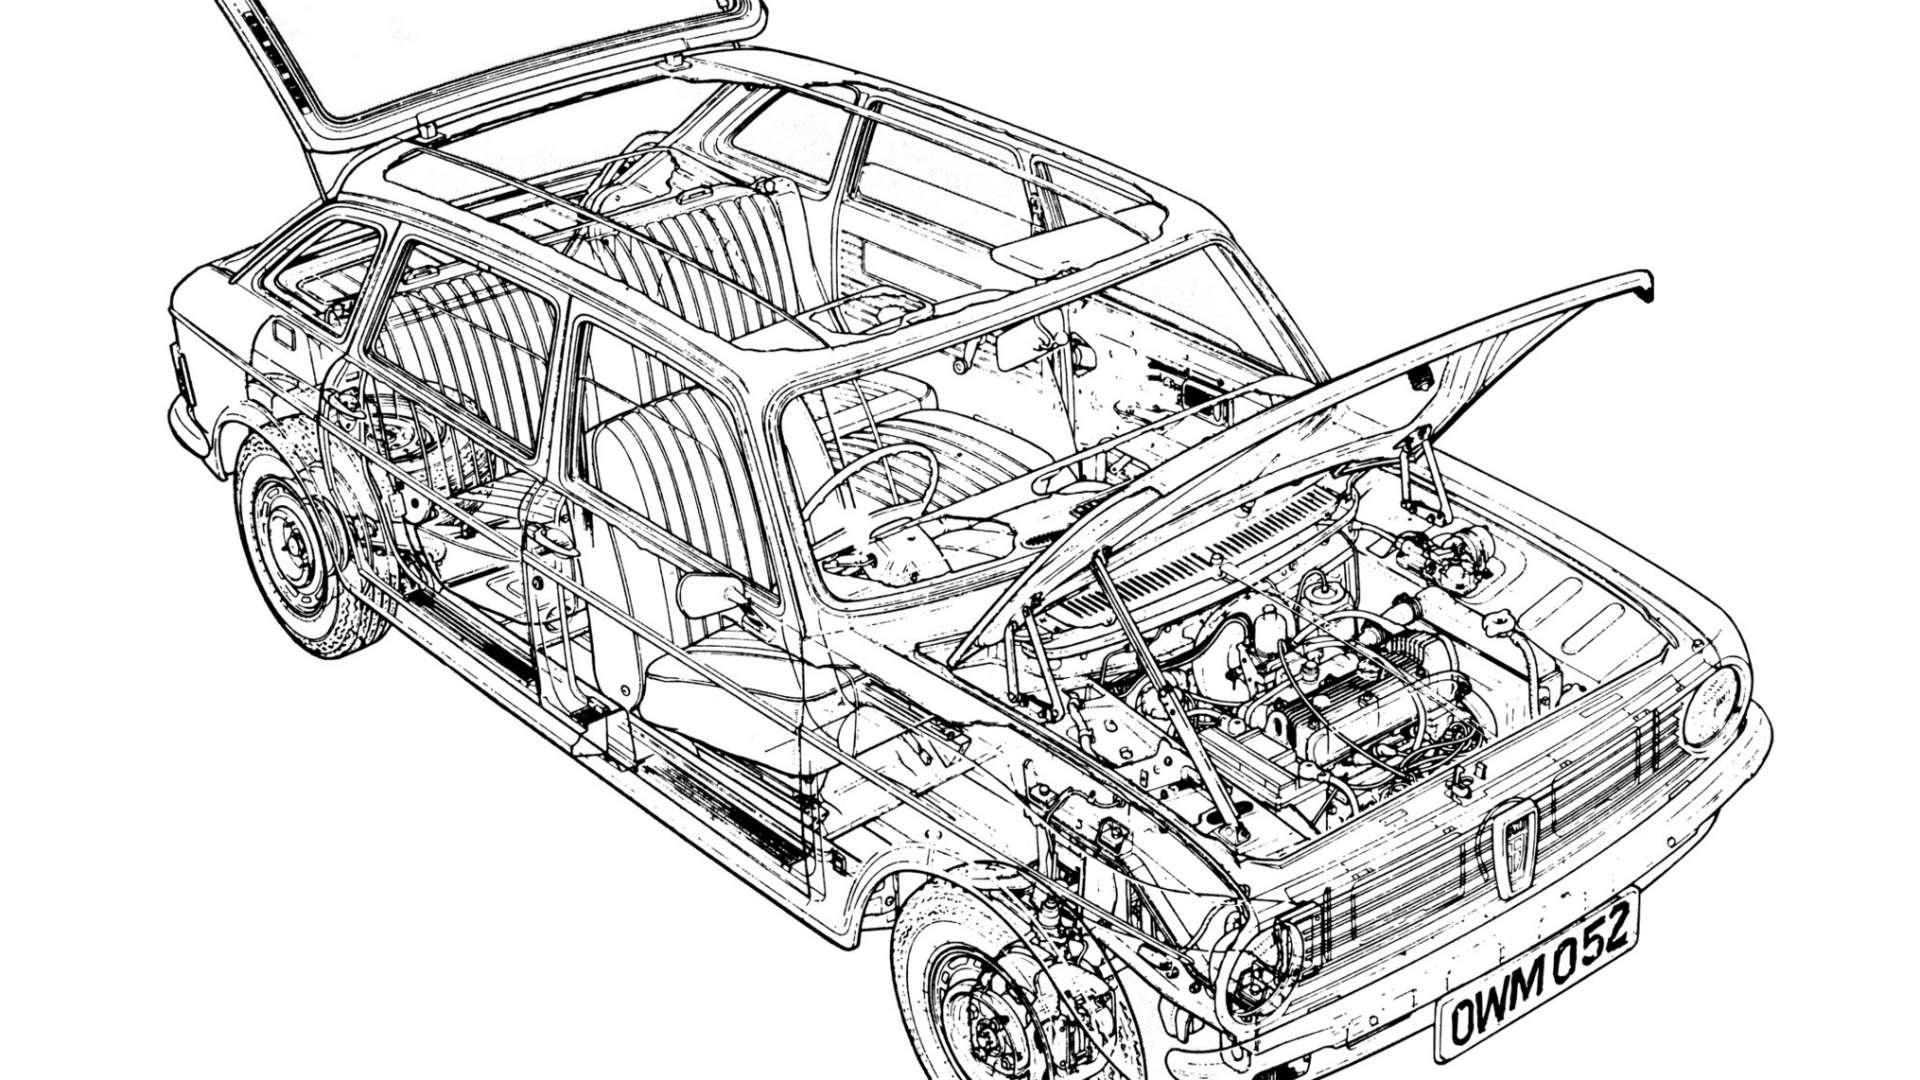 Austin Maxi cutaway